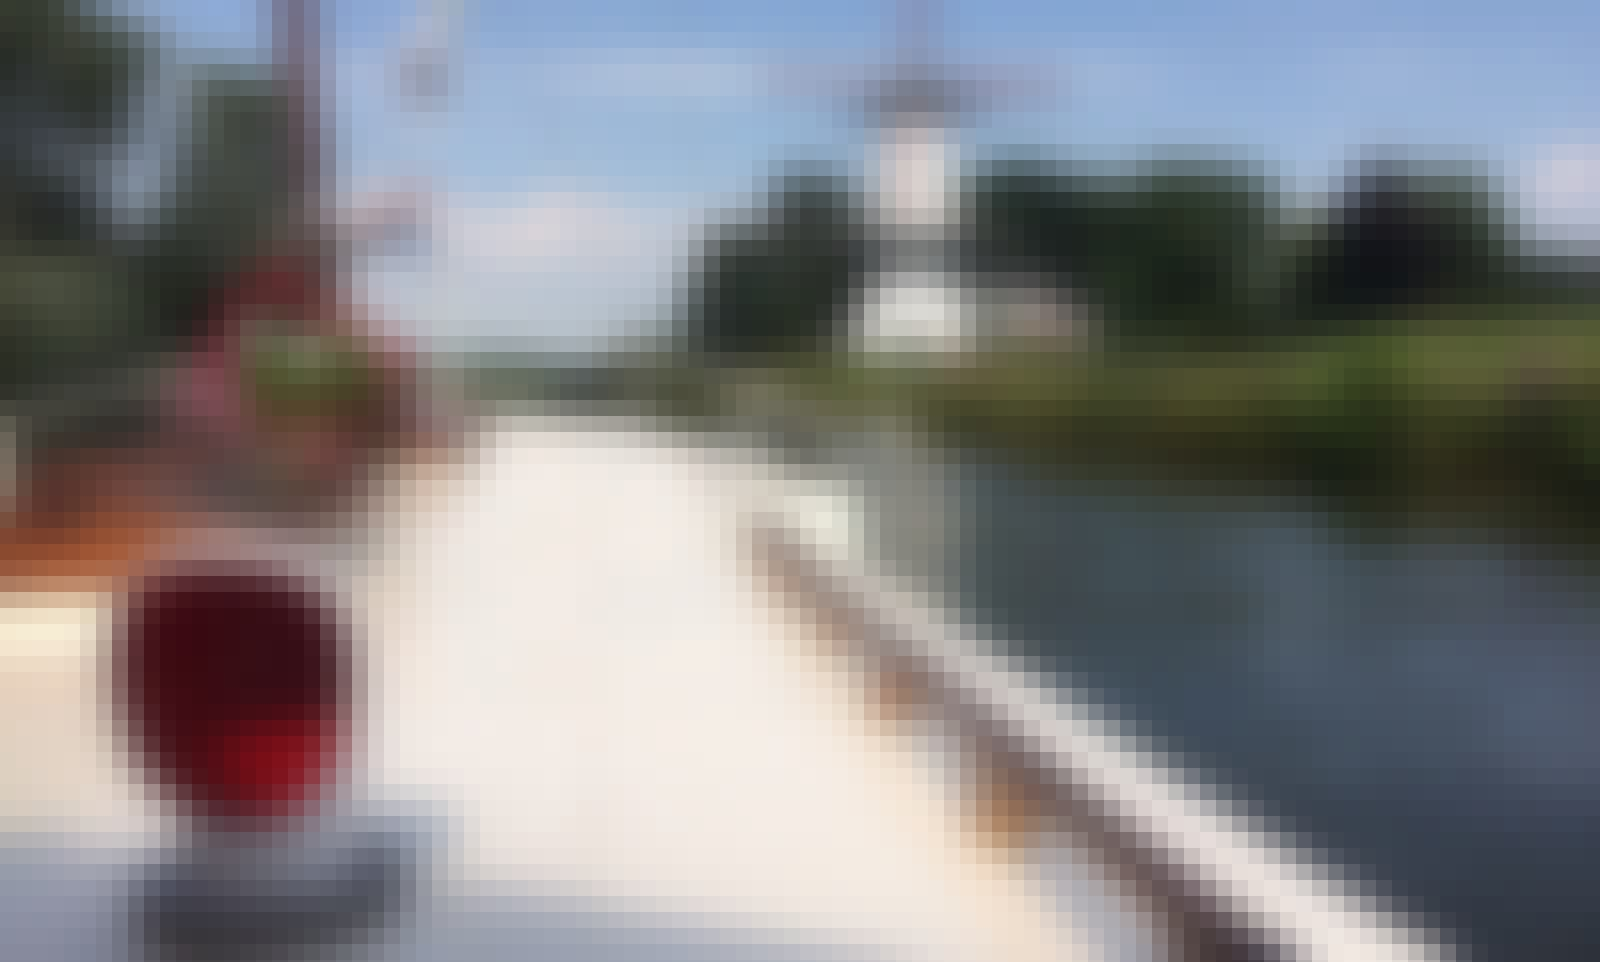 Enjoy River Cruise On 33' Bakdekkruiser Yacht In Deil, Netherlands